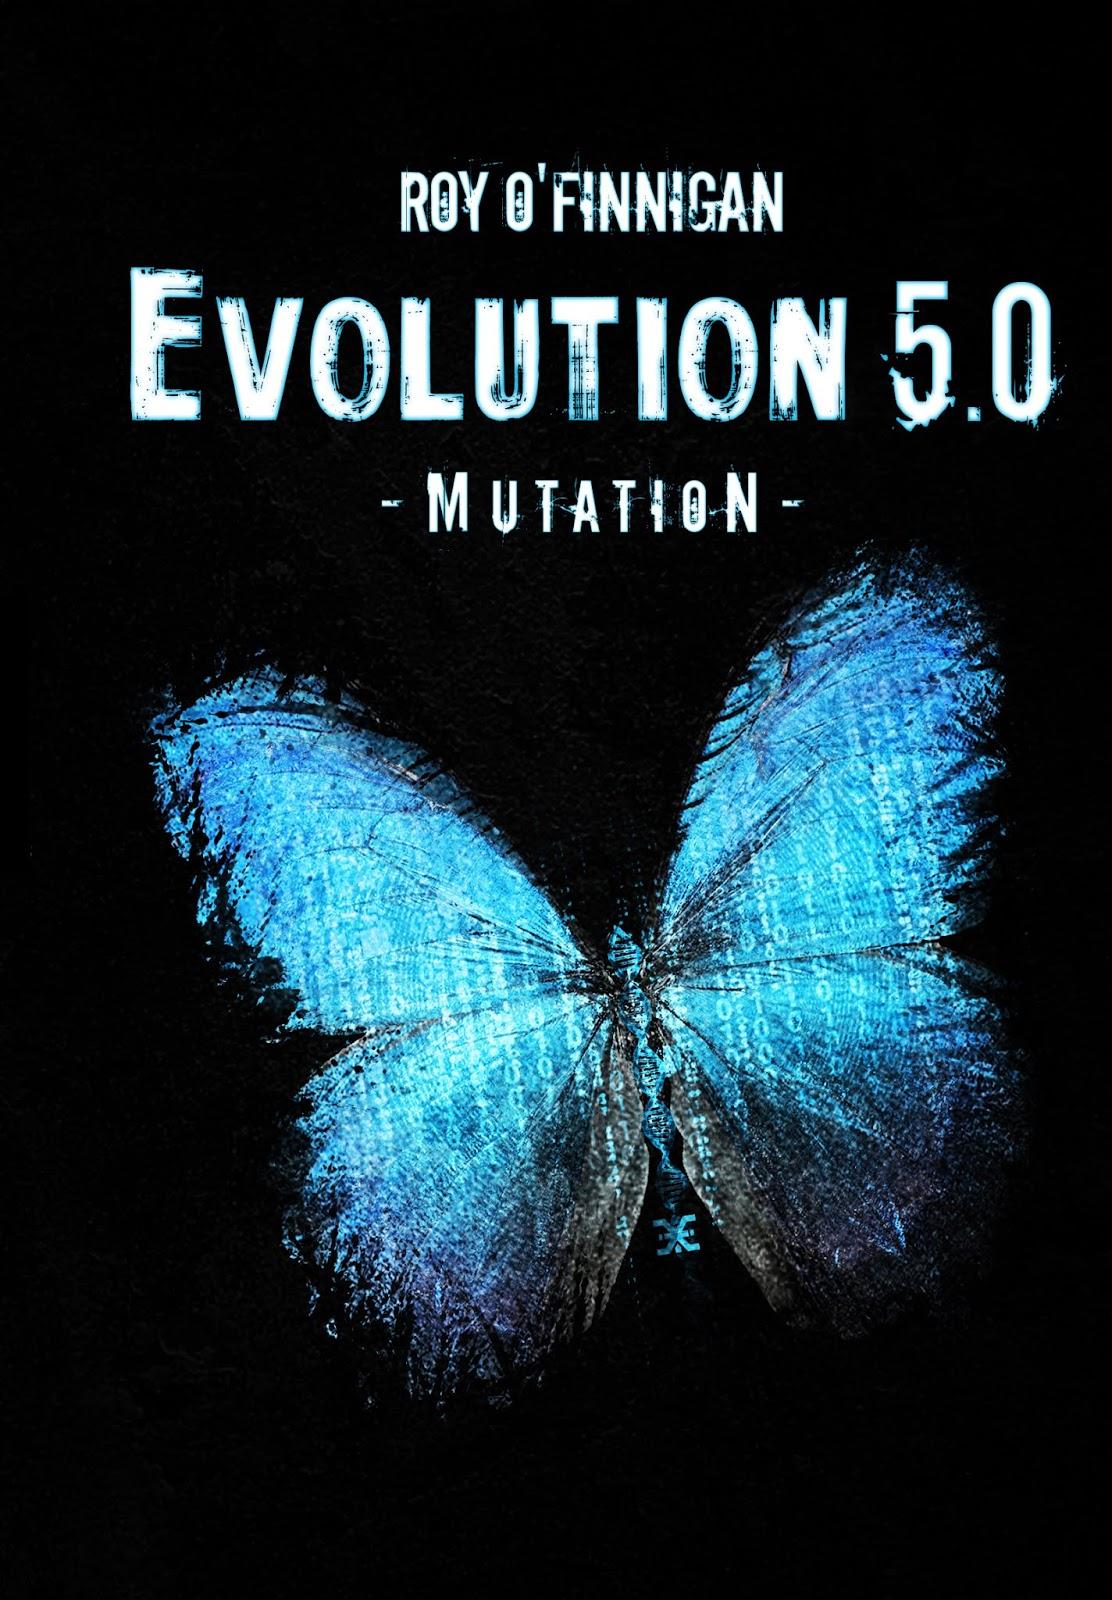 Evolution 5.0 - Mutation